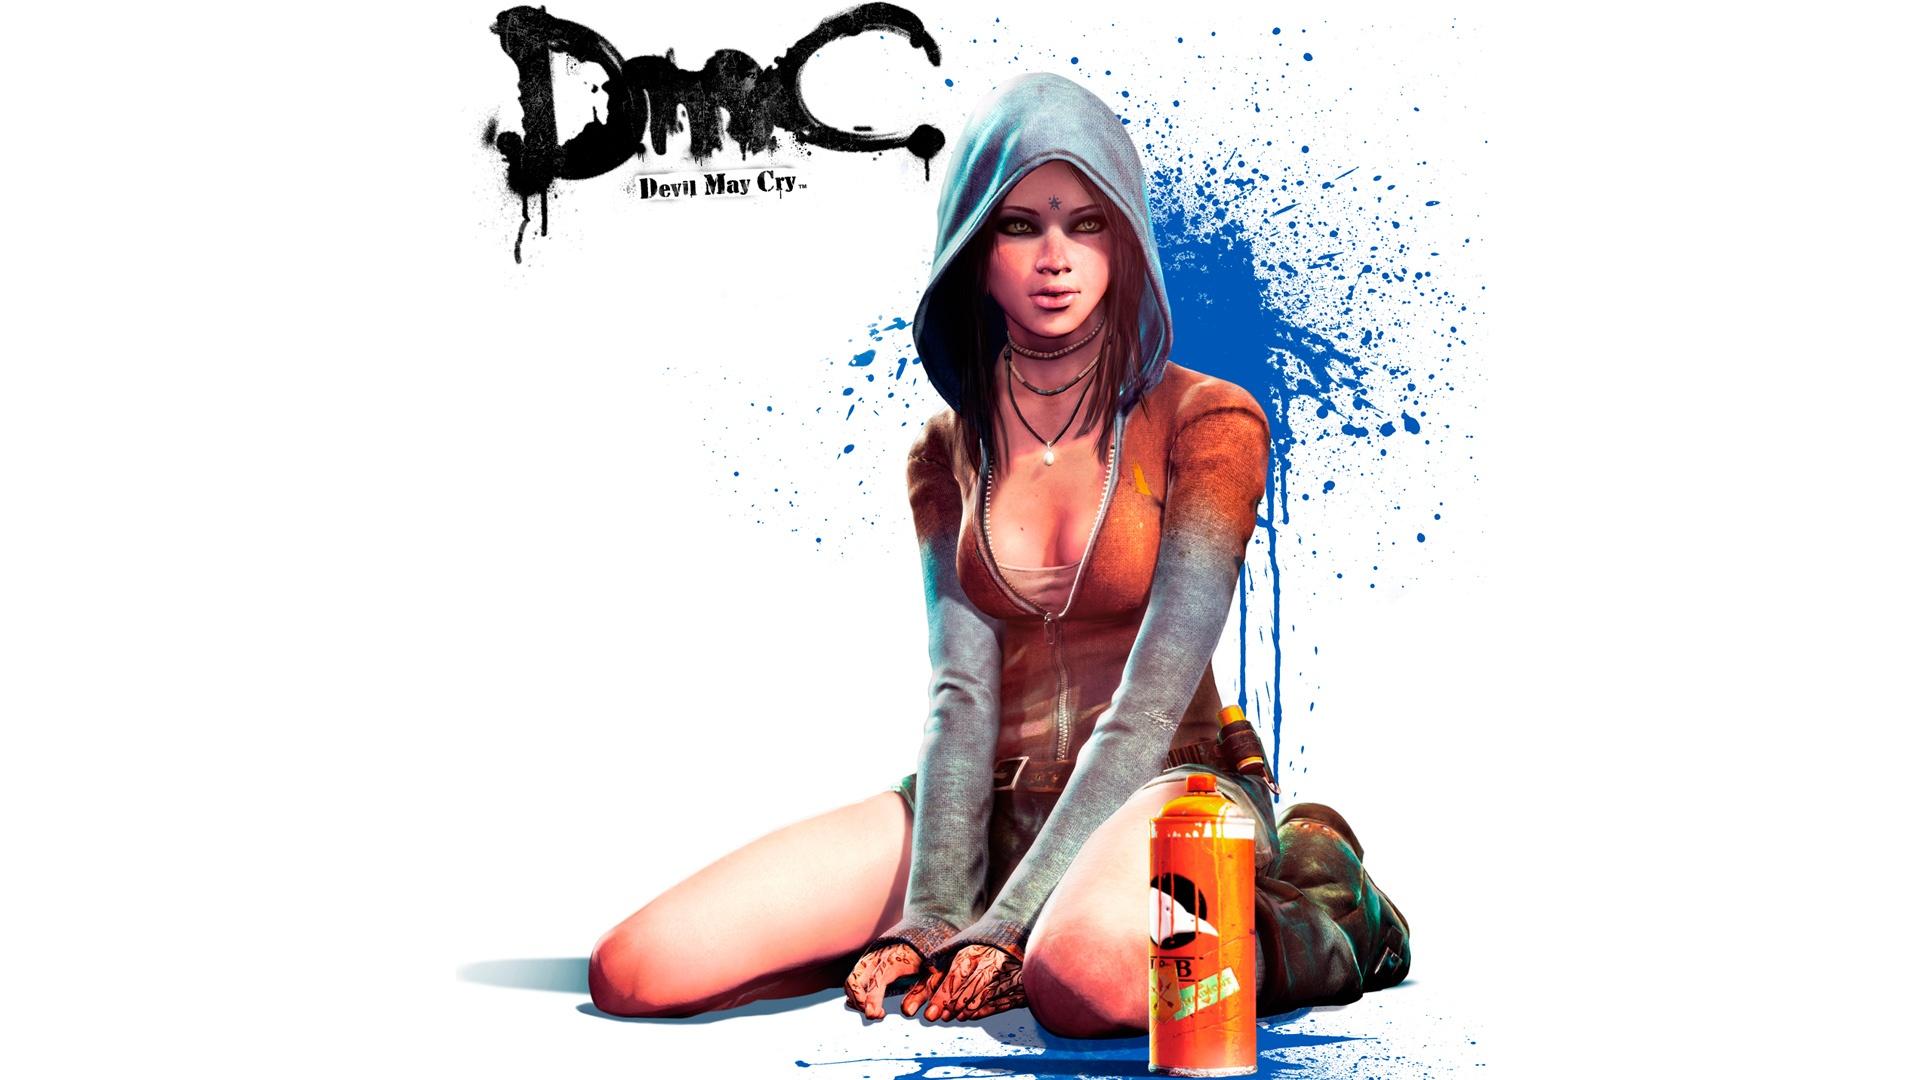 DmC Devil May Cry Demo für PS3 und XBOX 360